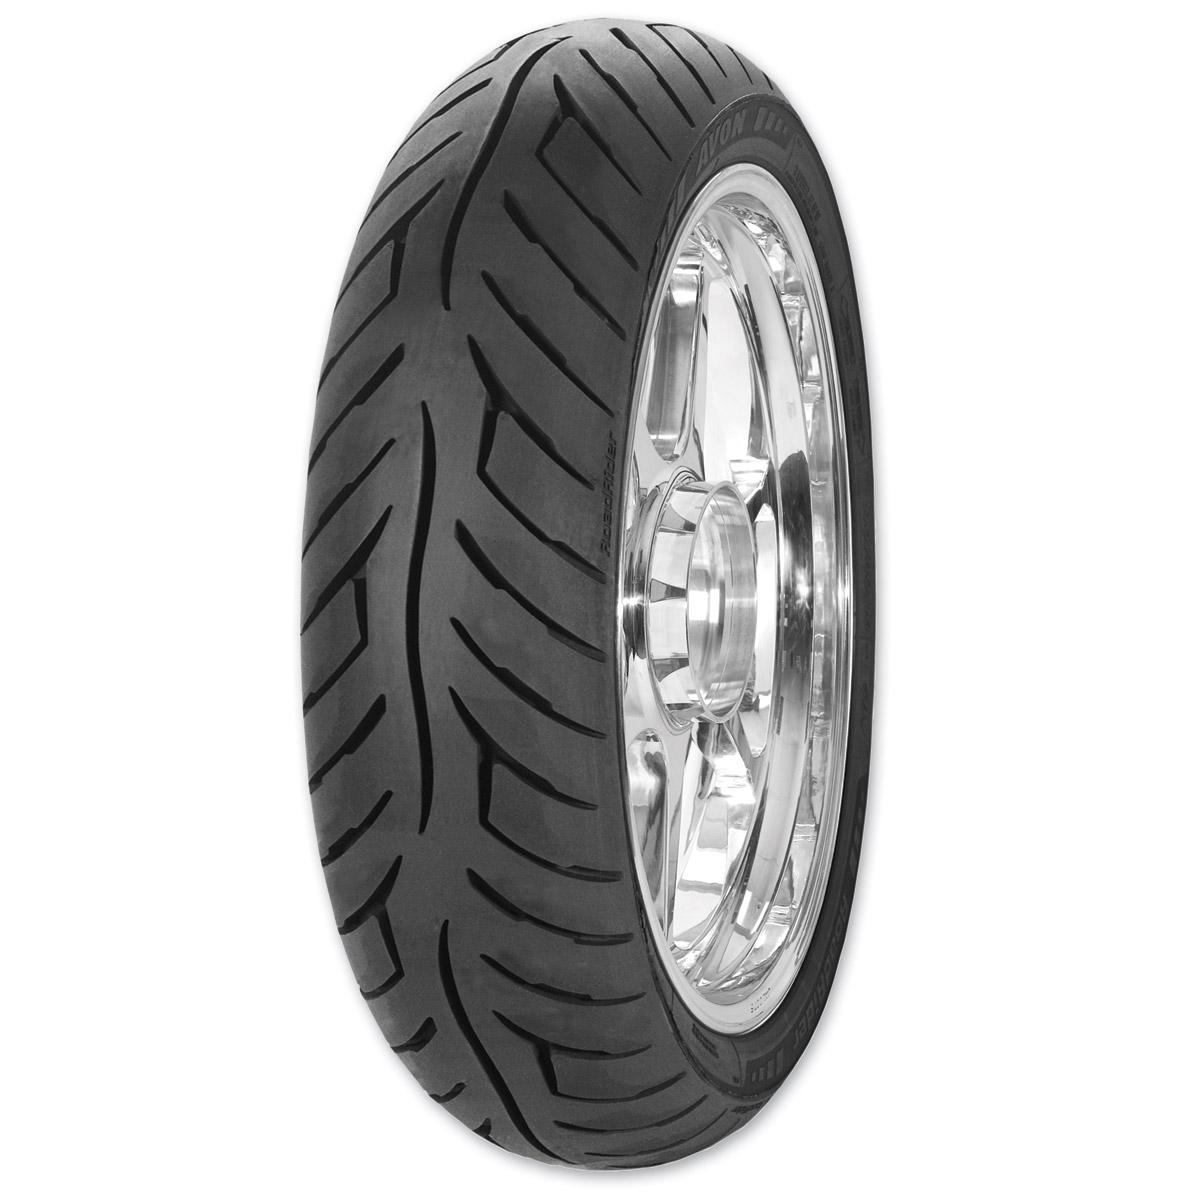 Avon AM26 Roadrider 130/70-17 Rear Tire